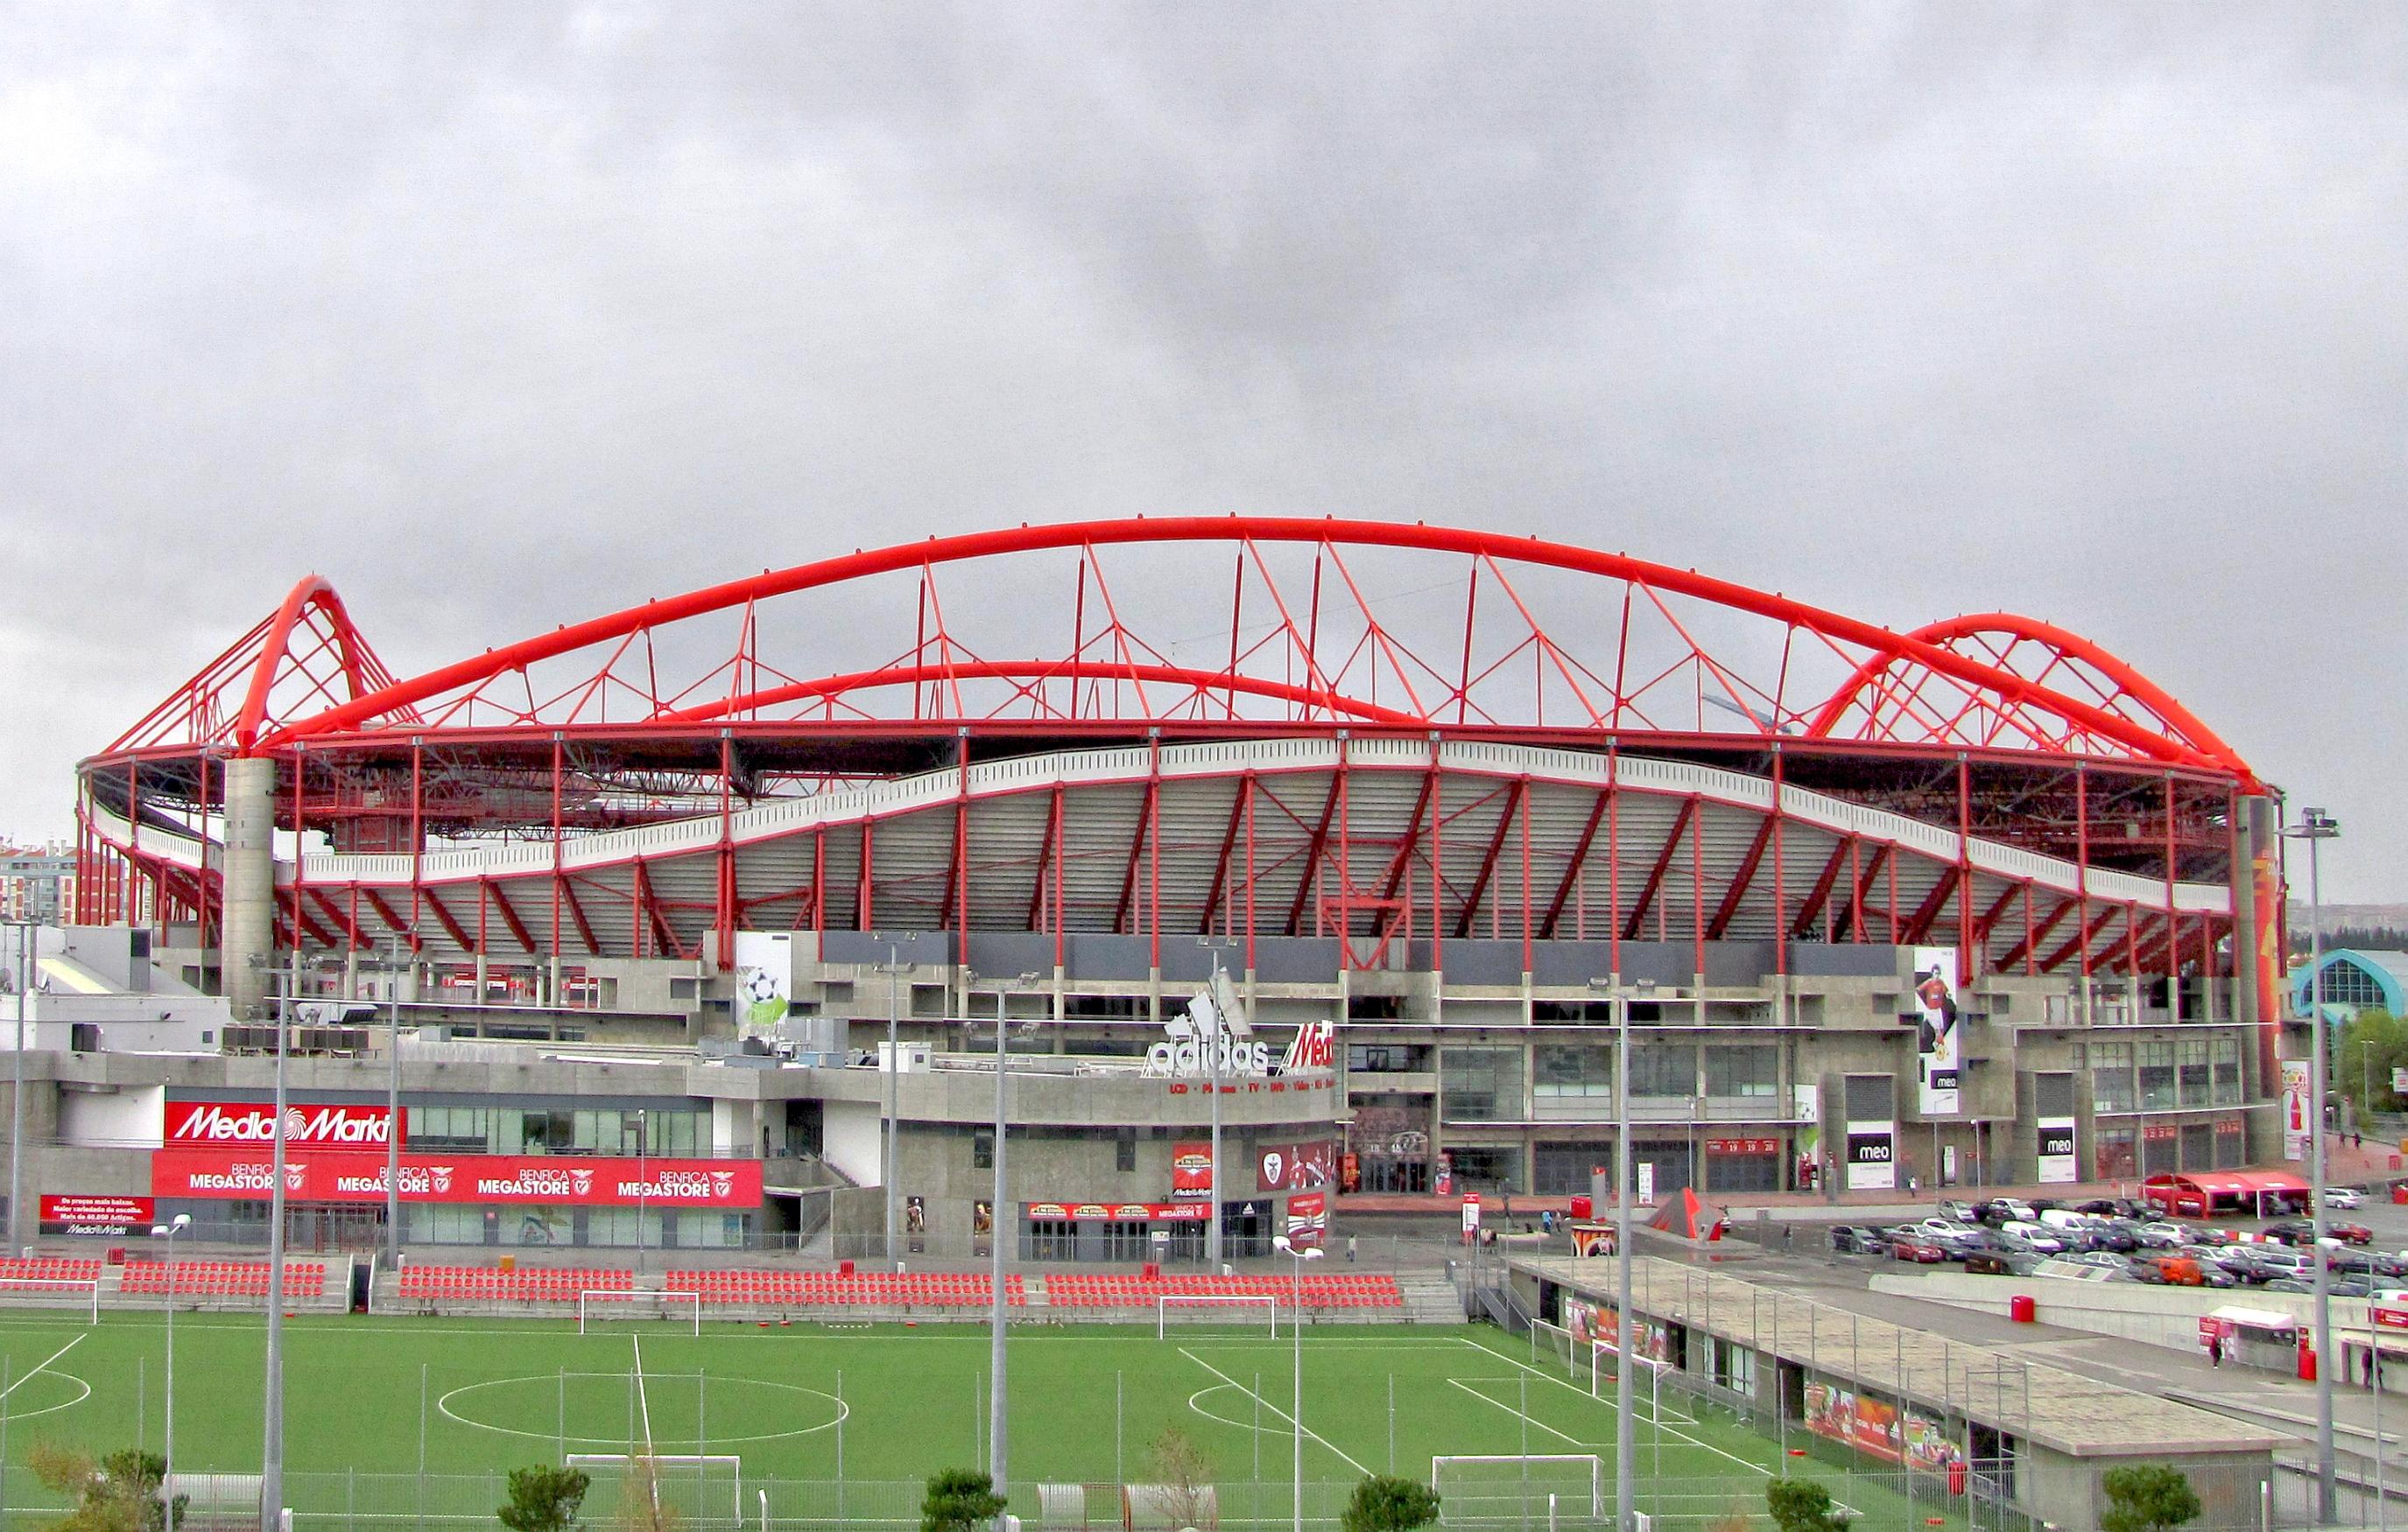 Museu do Benfica